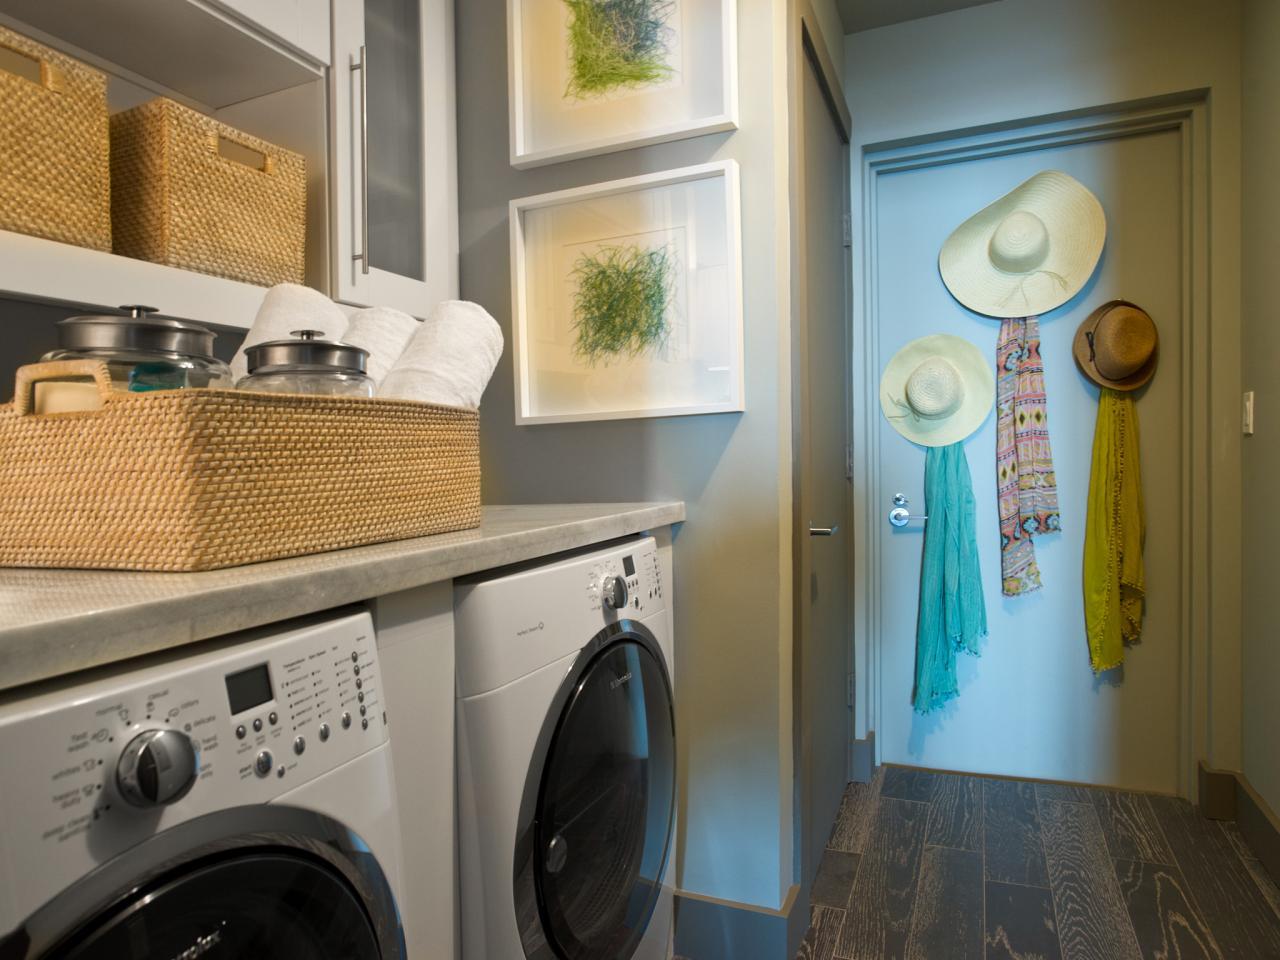 laundry room makeover ideas - Laundry Storage Ideas